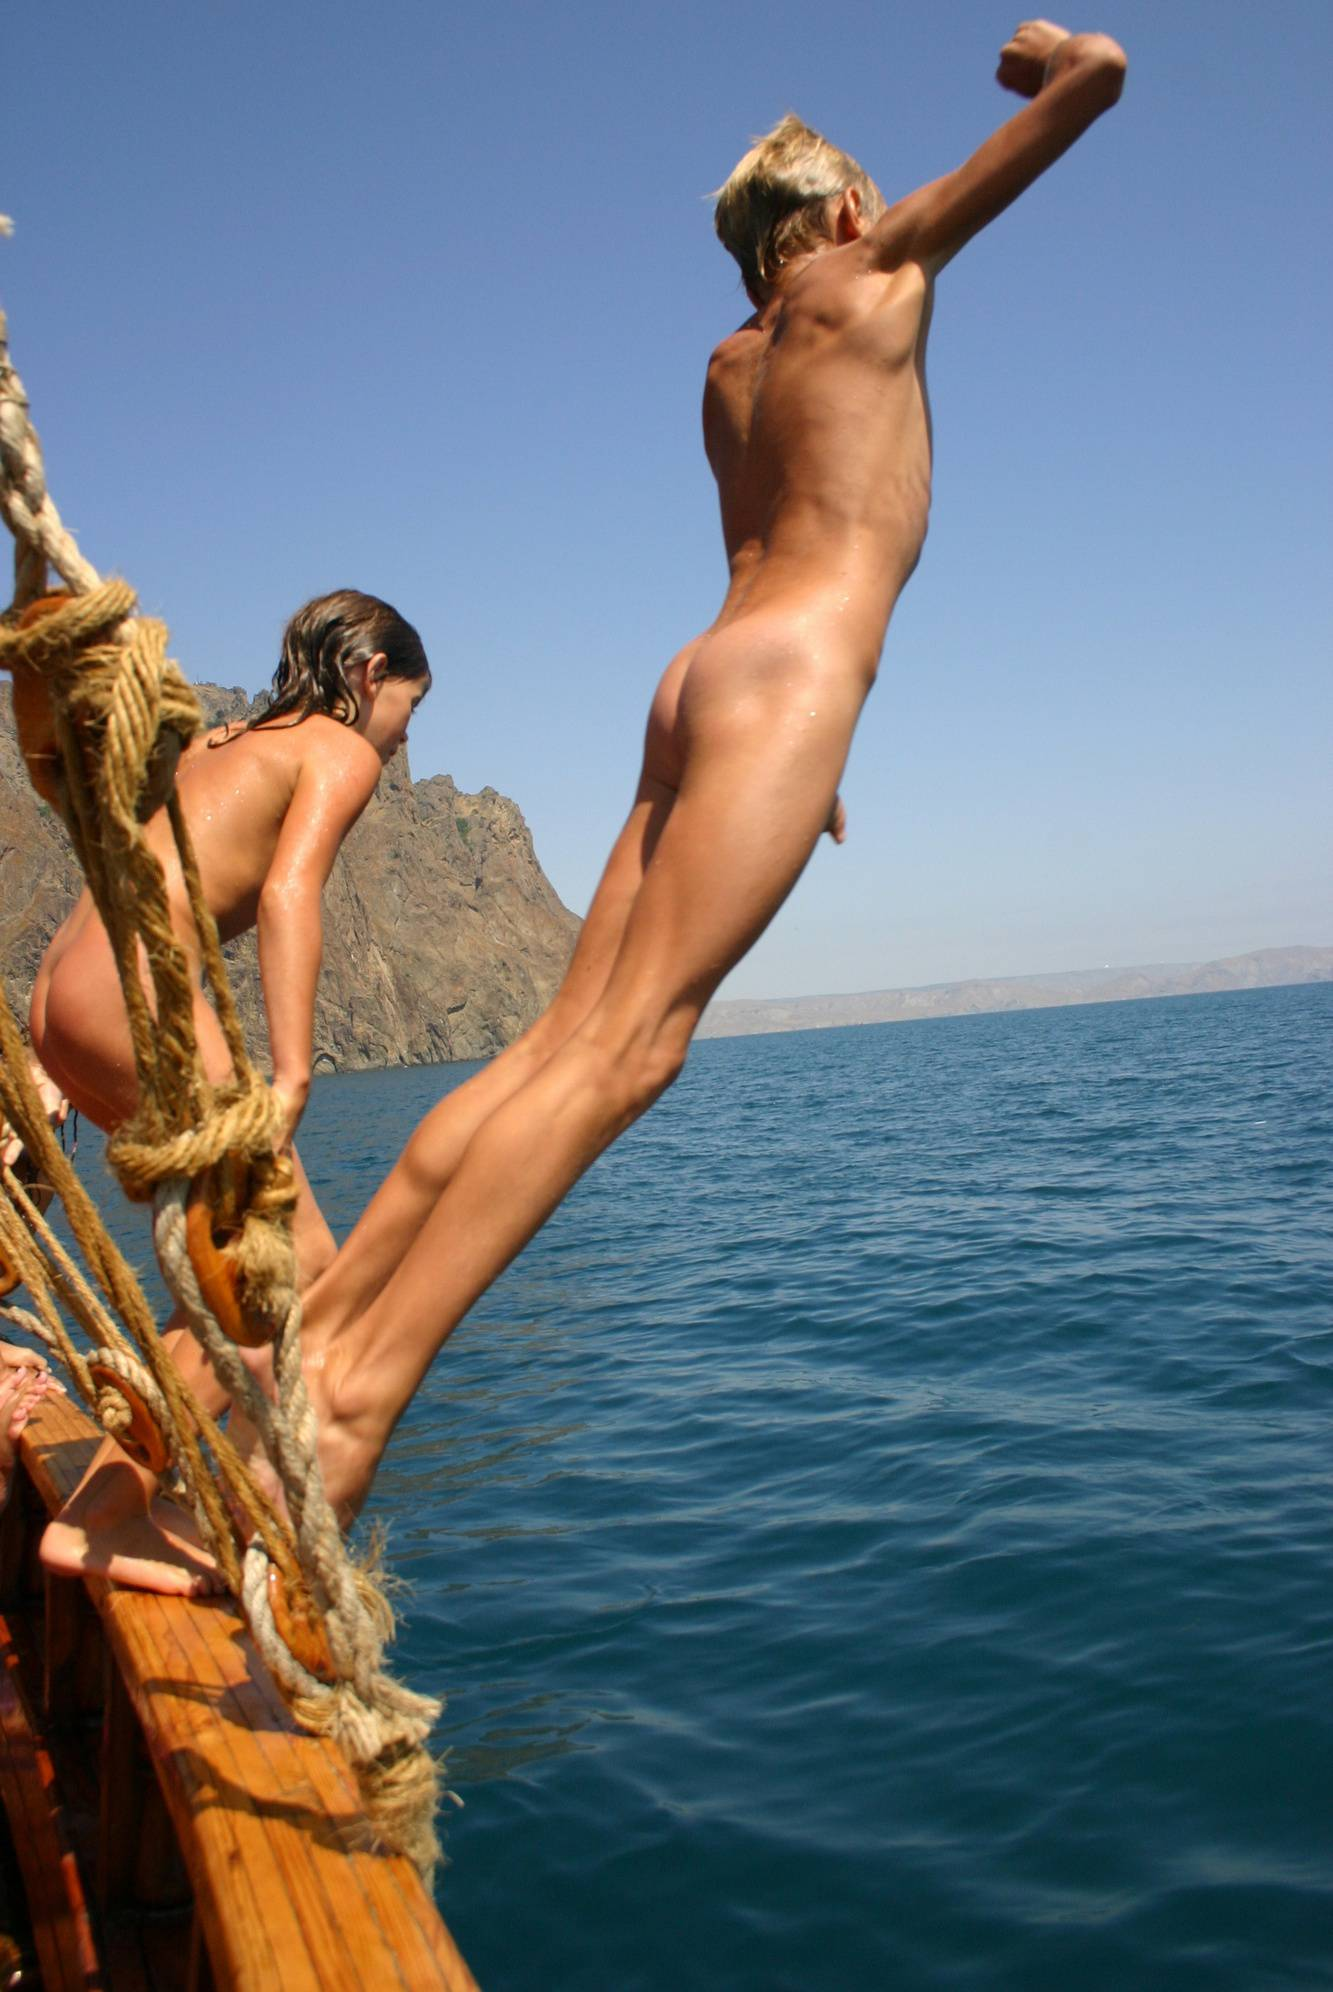 Ship Shape Lake Jumpers - 2